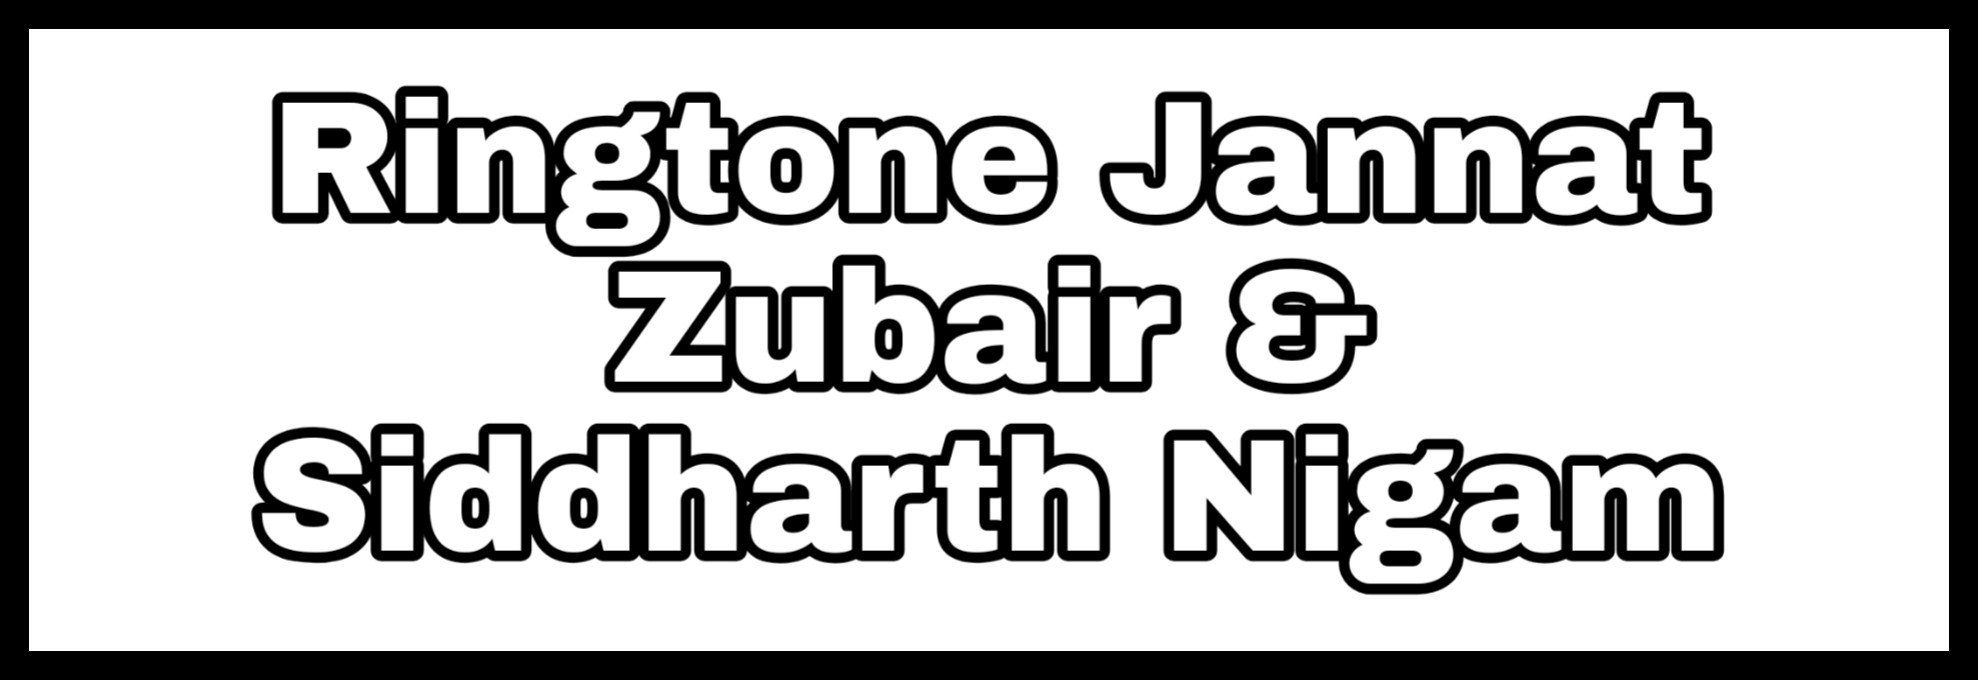 Ringtone Jannat Zubair